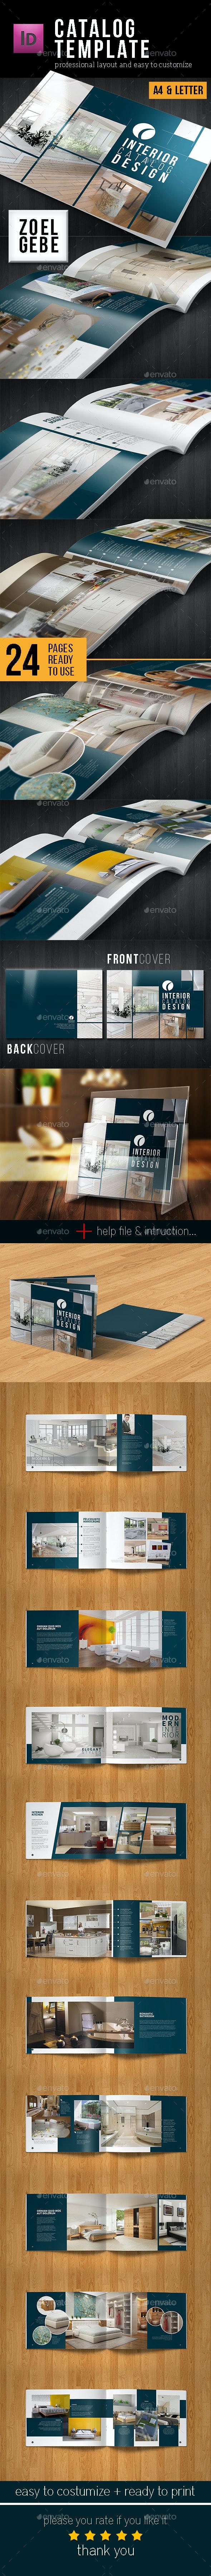 Multipurpose Catalog Template - Brochures Print Templates